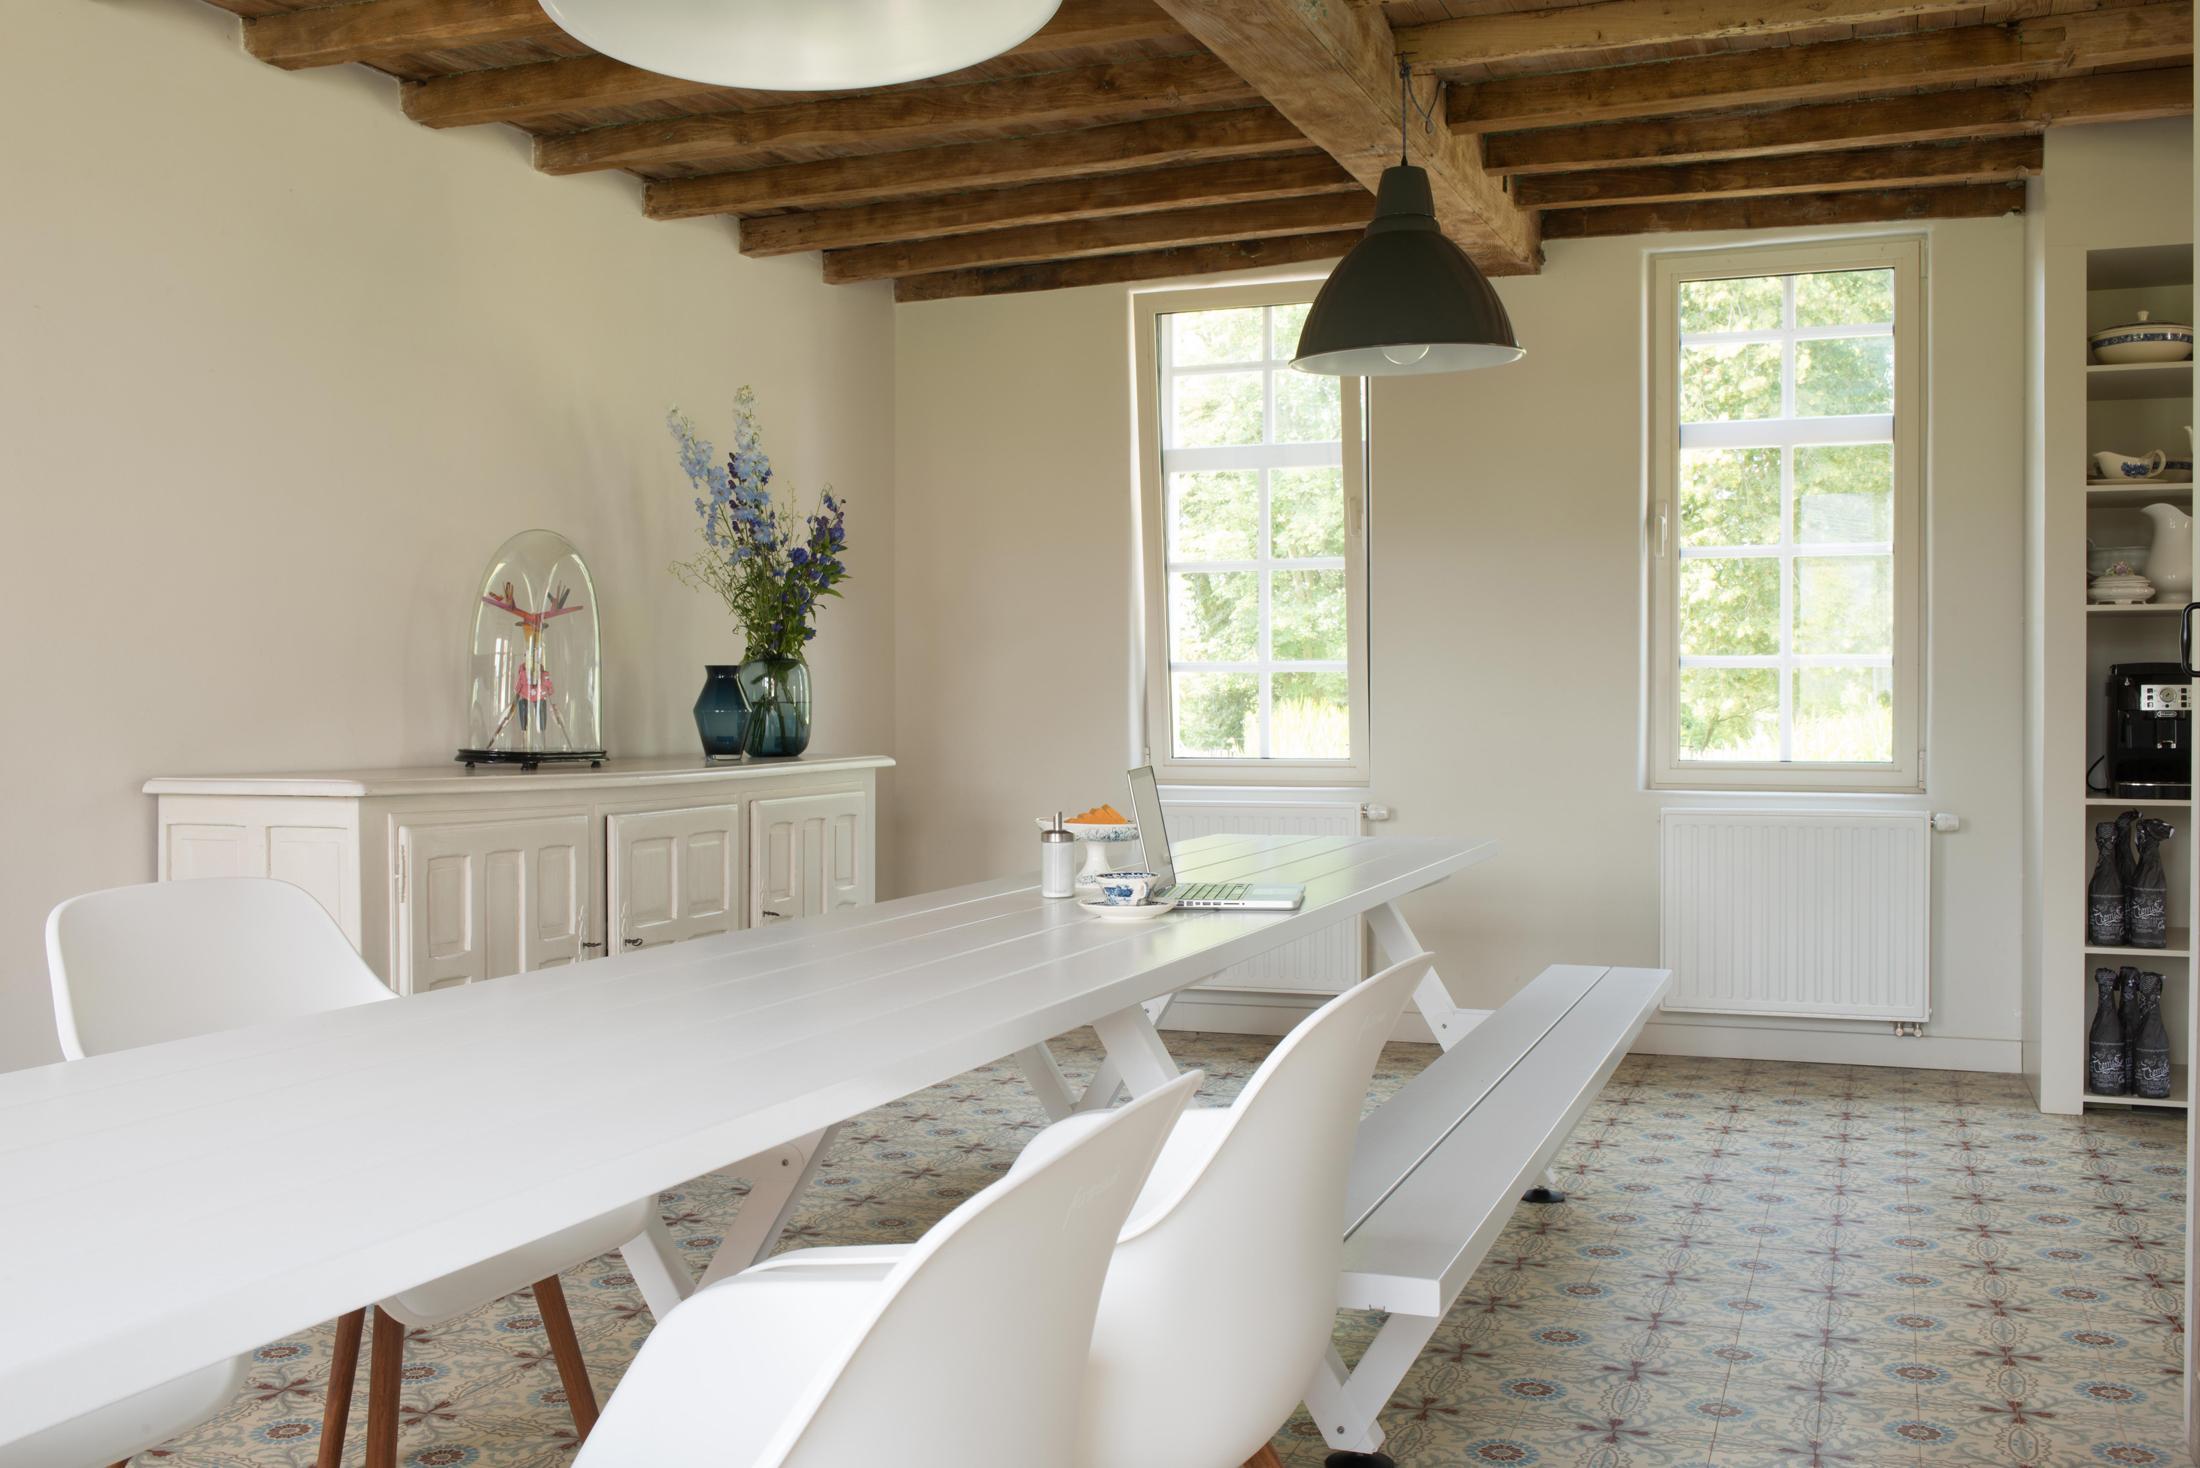 Holzdecke Bilder Ideen Couch